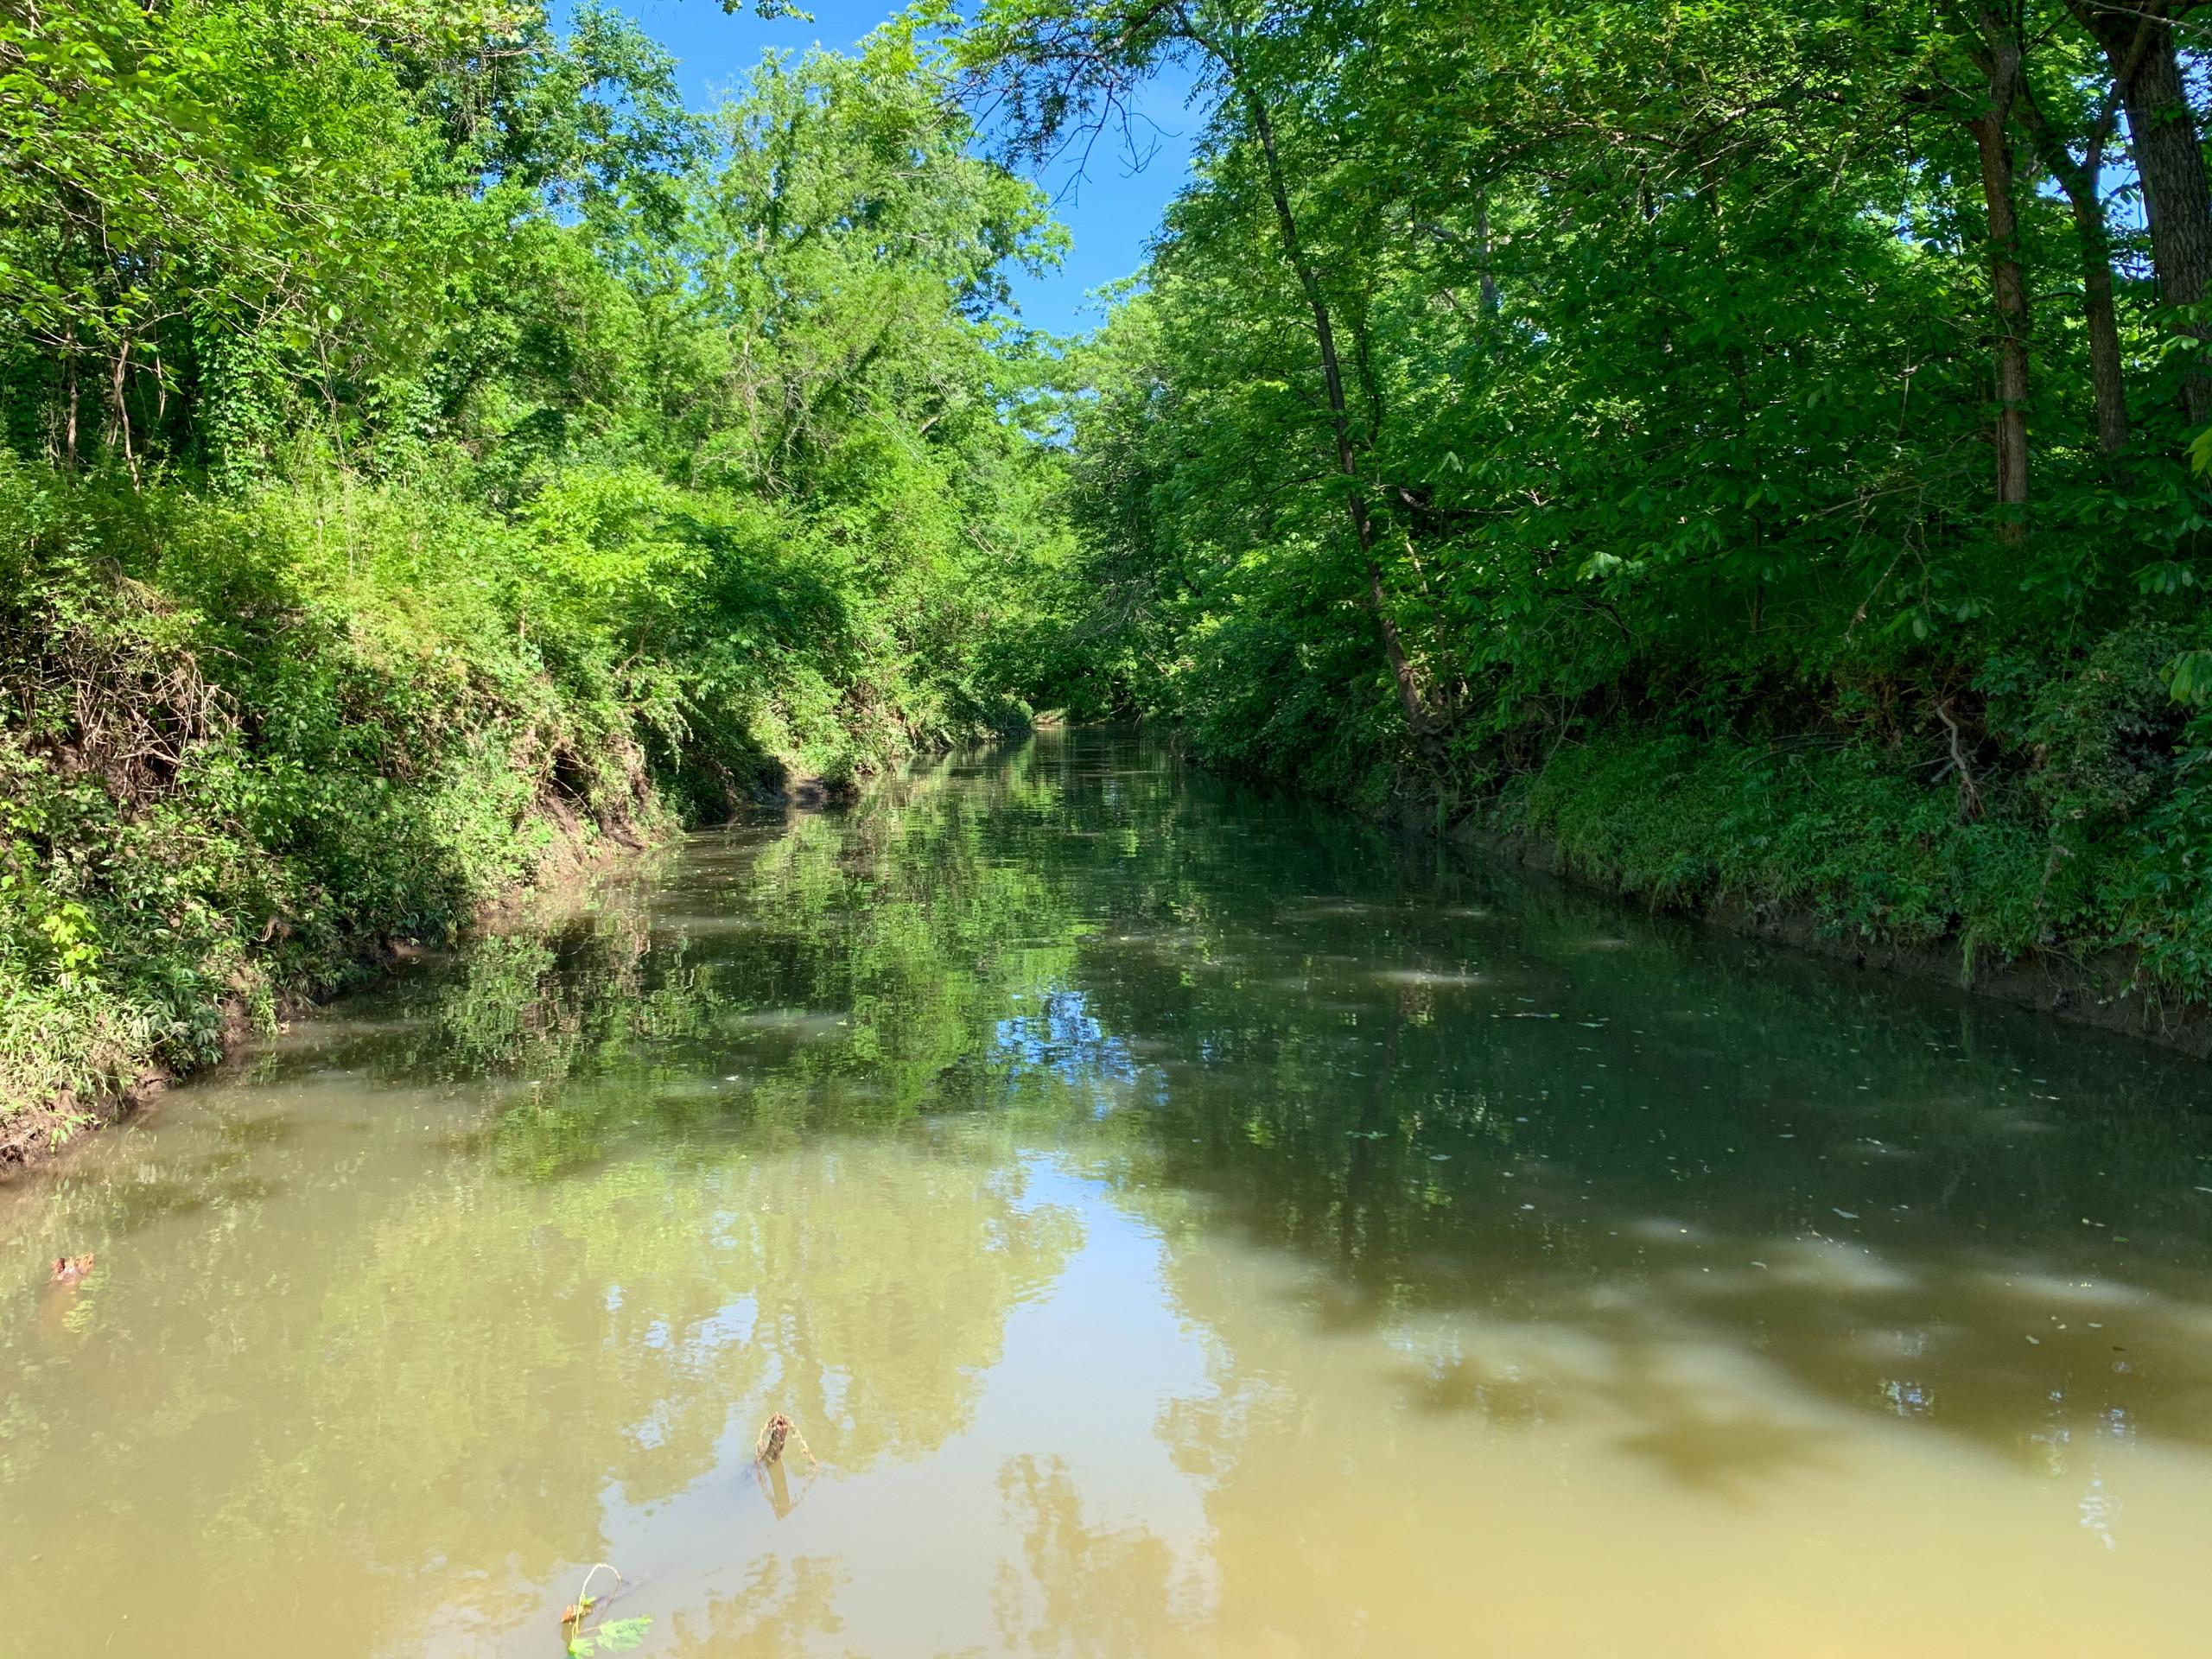 Triple Creek Farm